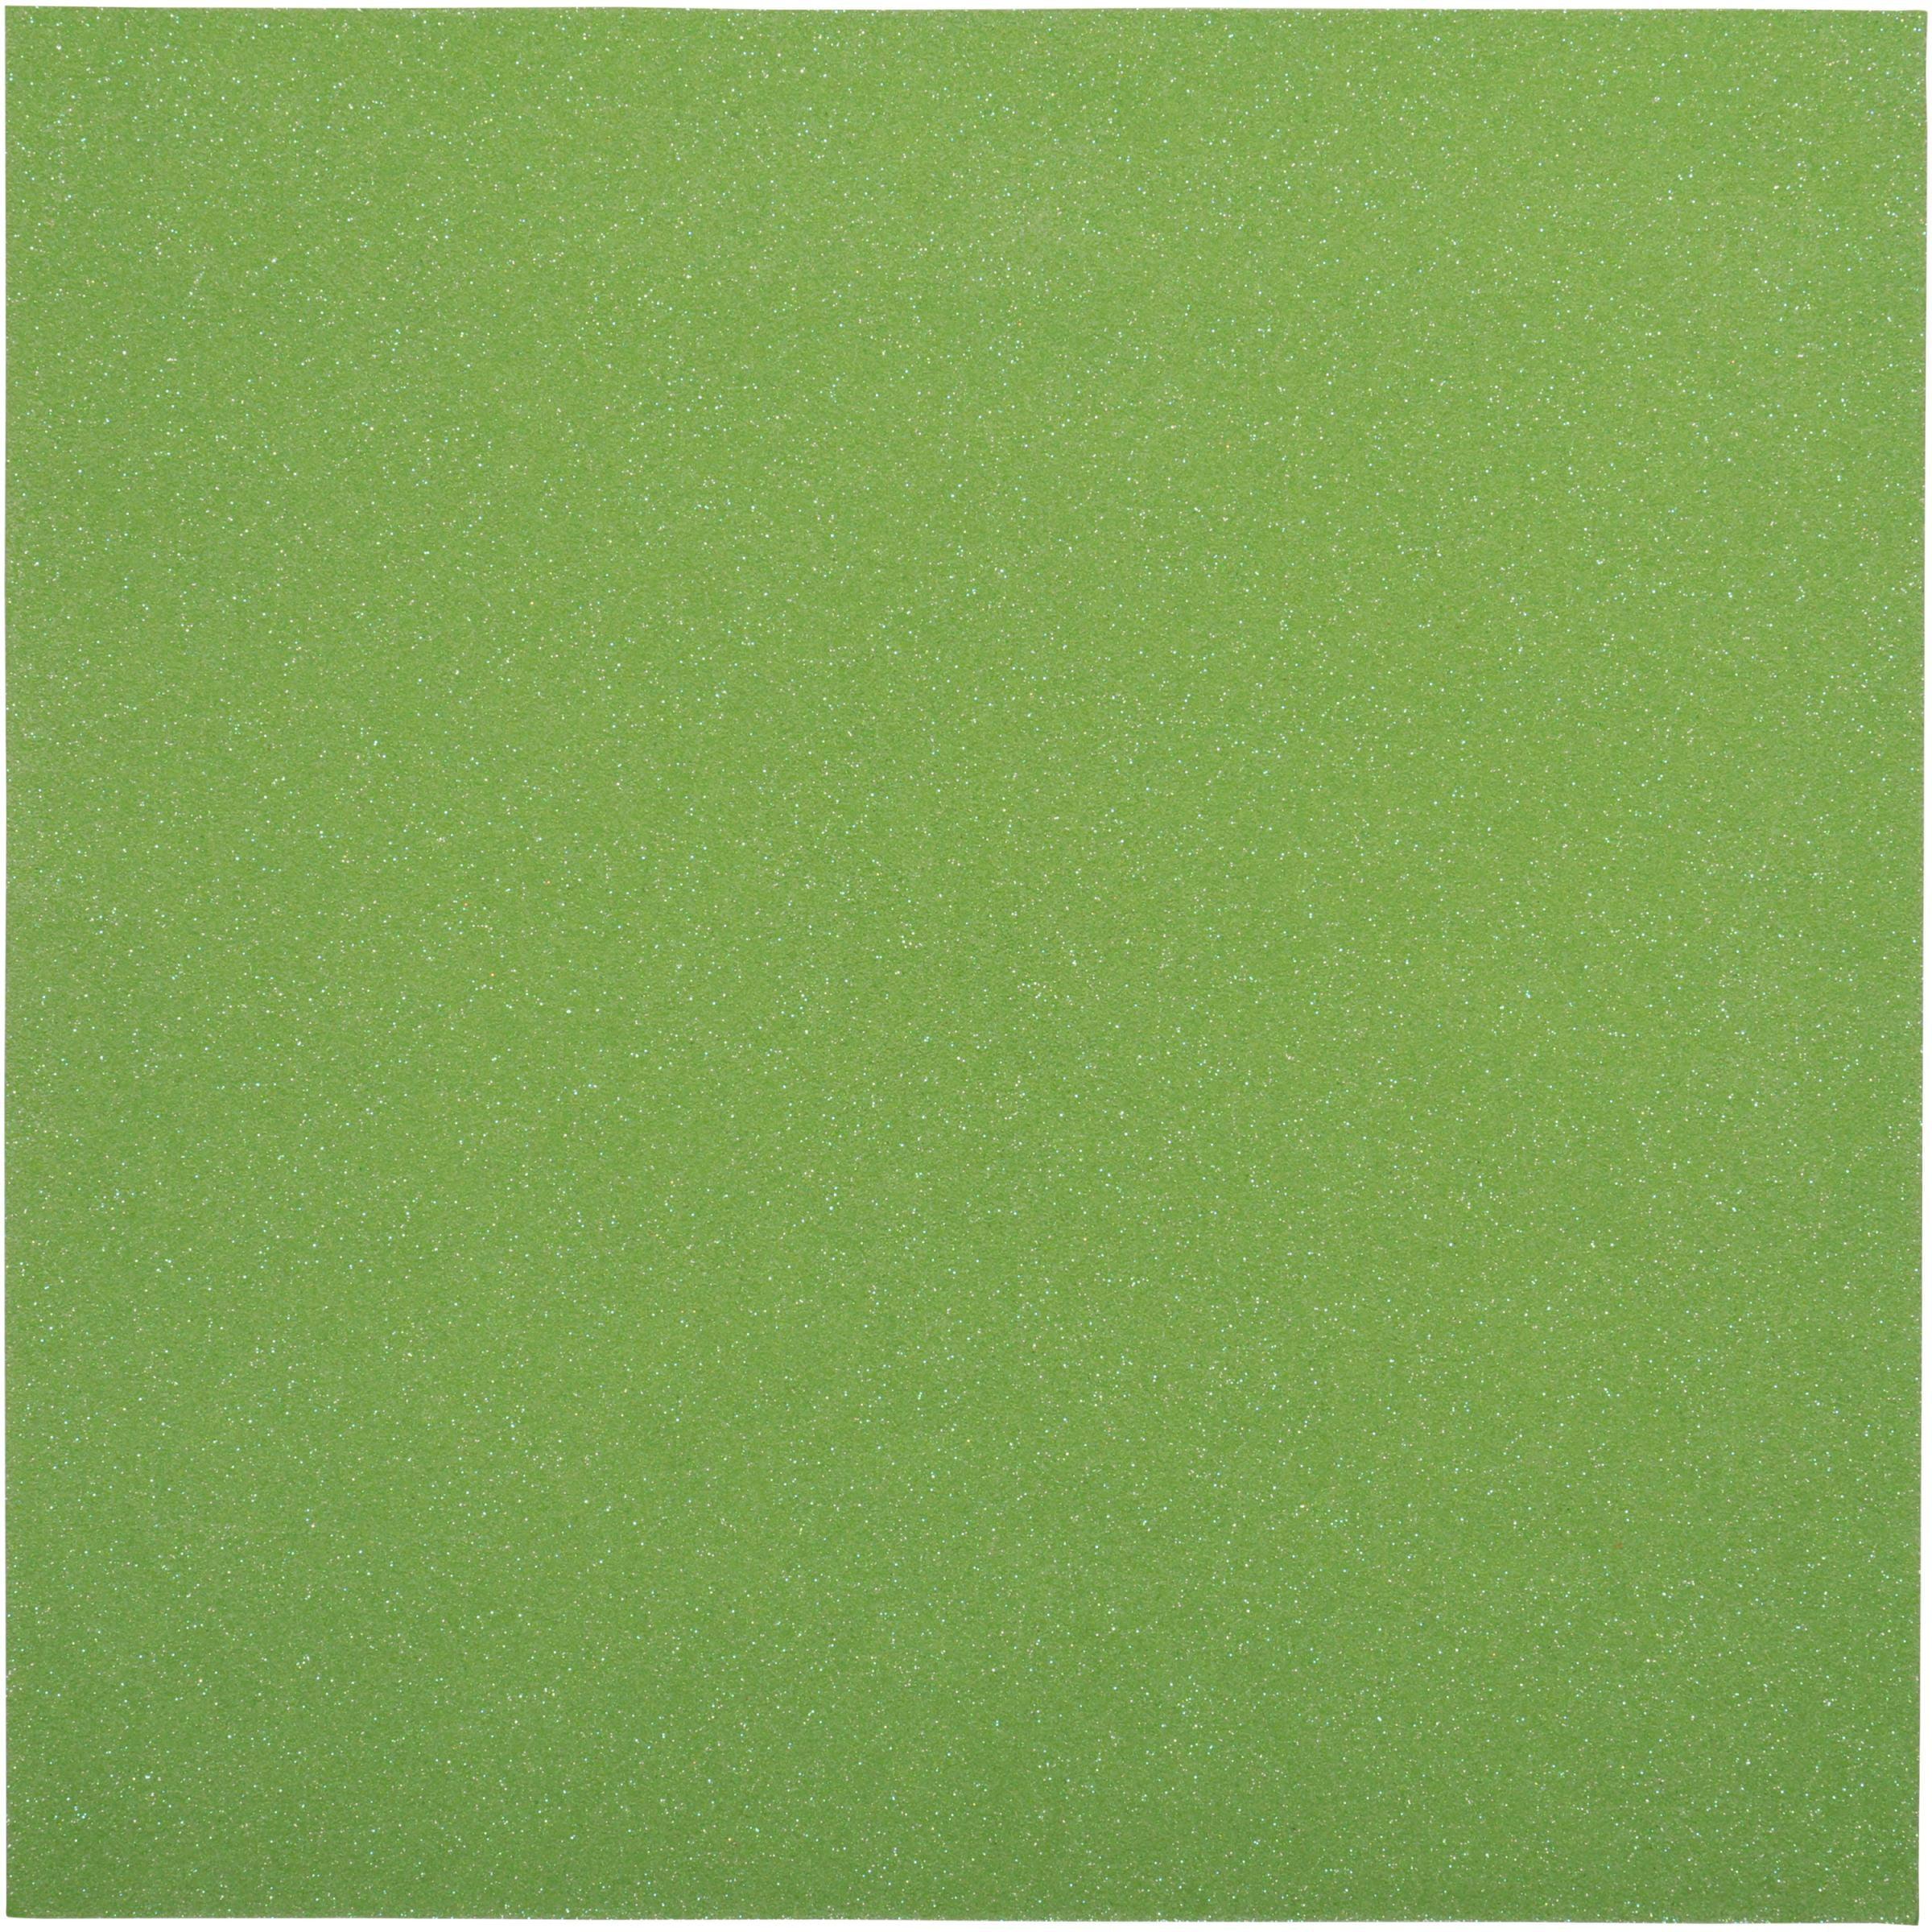 Colorbok 12 Glitter Paper Assortment